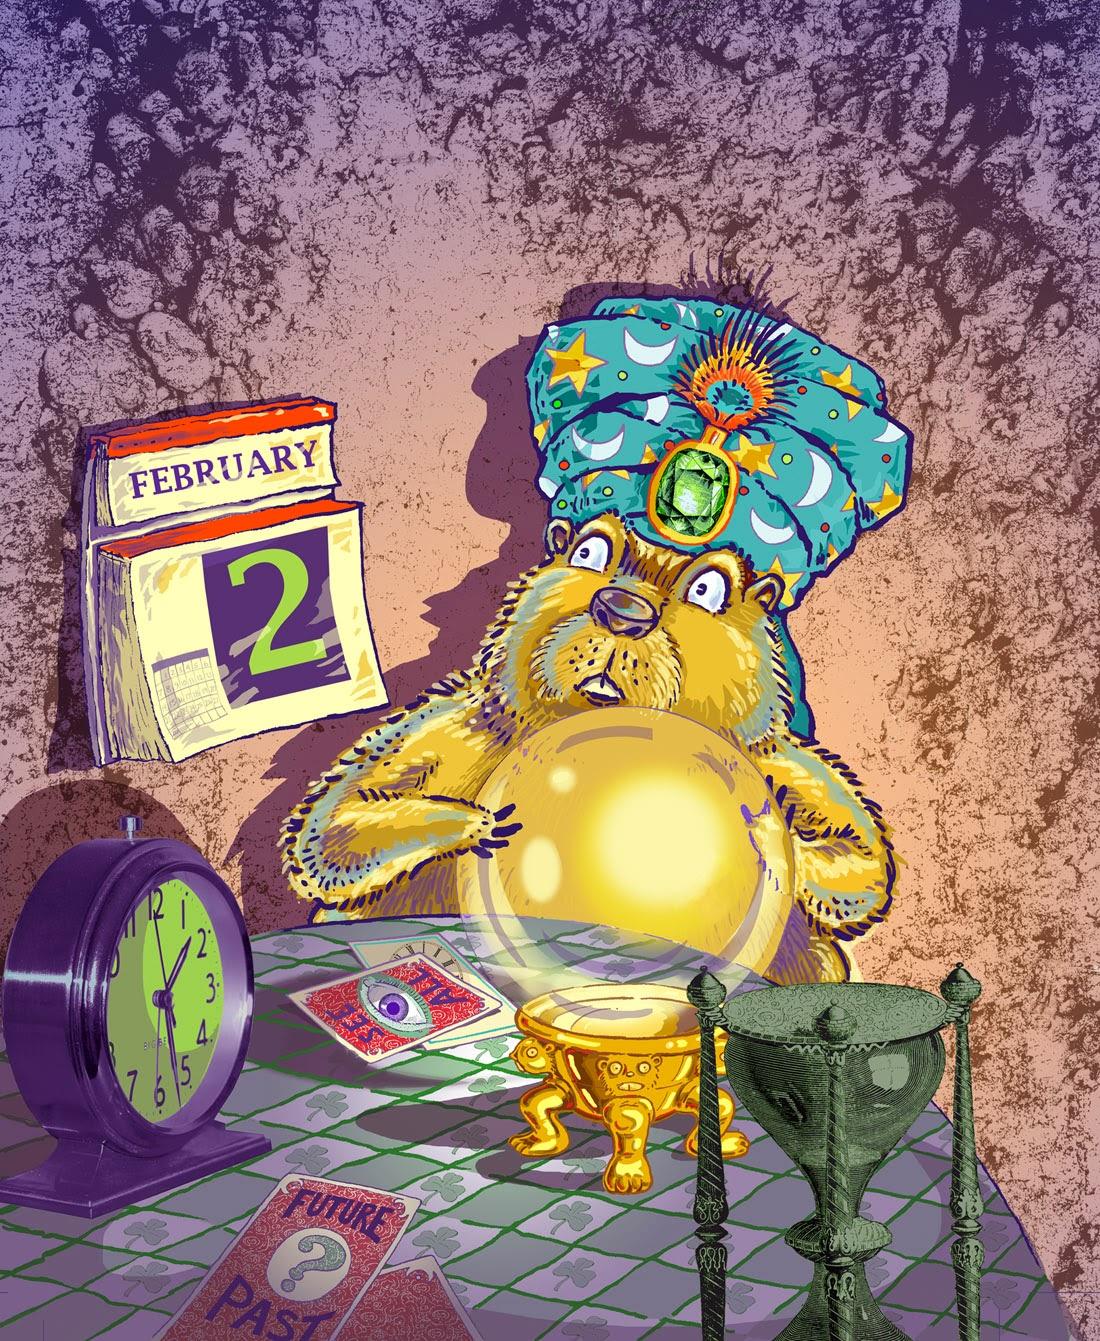 groundhog, woodchuck, whistle-pig, rodent, Punxsutawney Phil, Pennsylvania, deadline, Spider magazine, magazine cover, tablecloth, shamrocks, March, February, prediction, predicting, time, late-night, fortune-teller, future, predict the future, winter, spring, garden, gardens